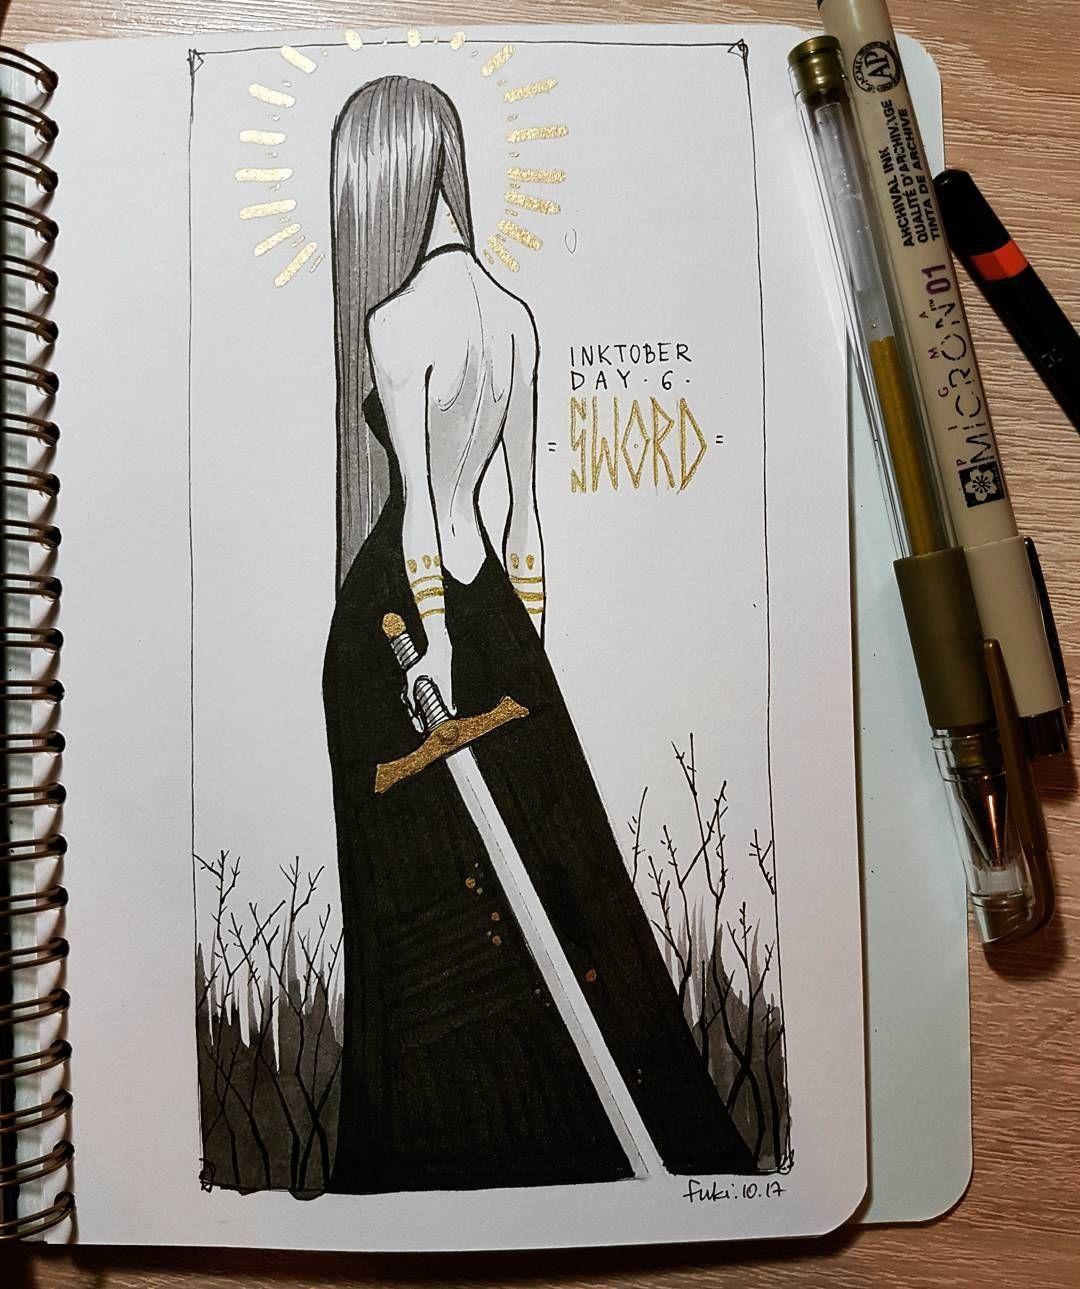 "Fuki / Fukari sur Instagram: «Jour 6 - épée 🗡️ Rapide, car je suis tellement en retard avec ce défi! # inktober2017 #inktober #witchtober """